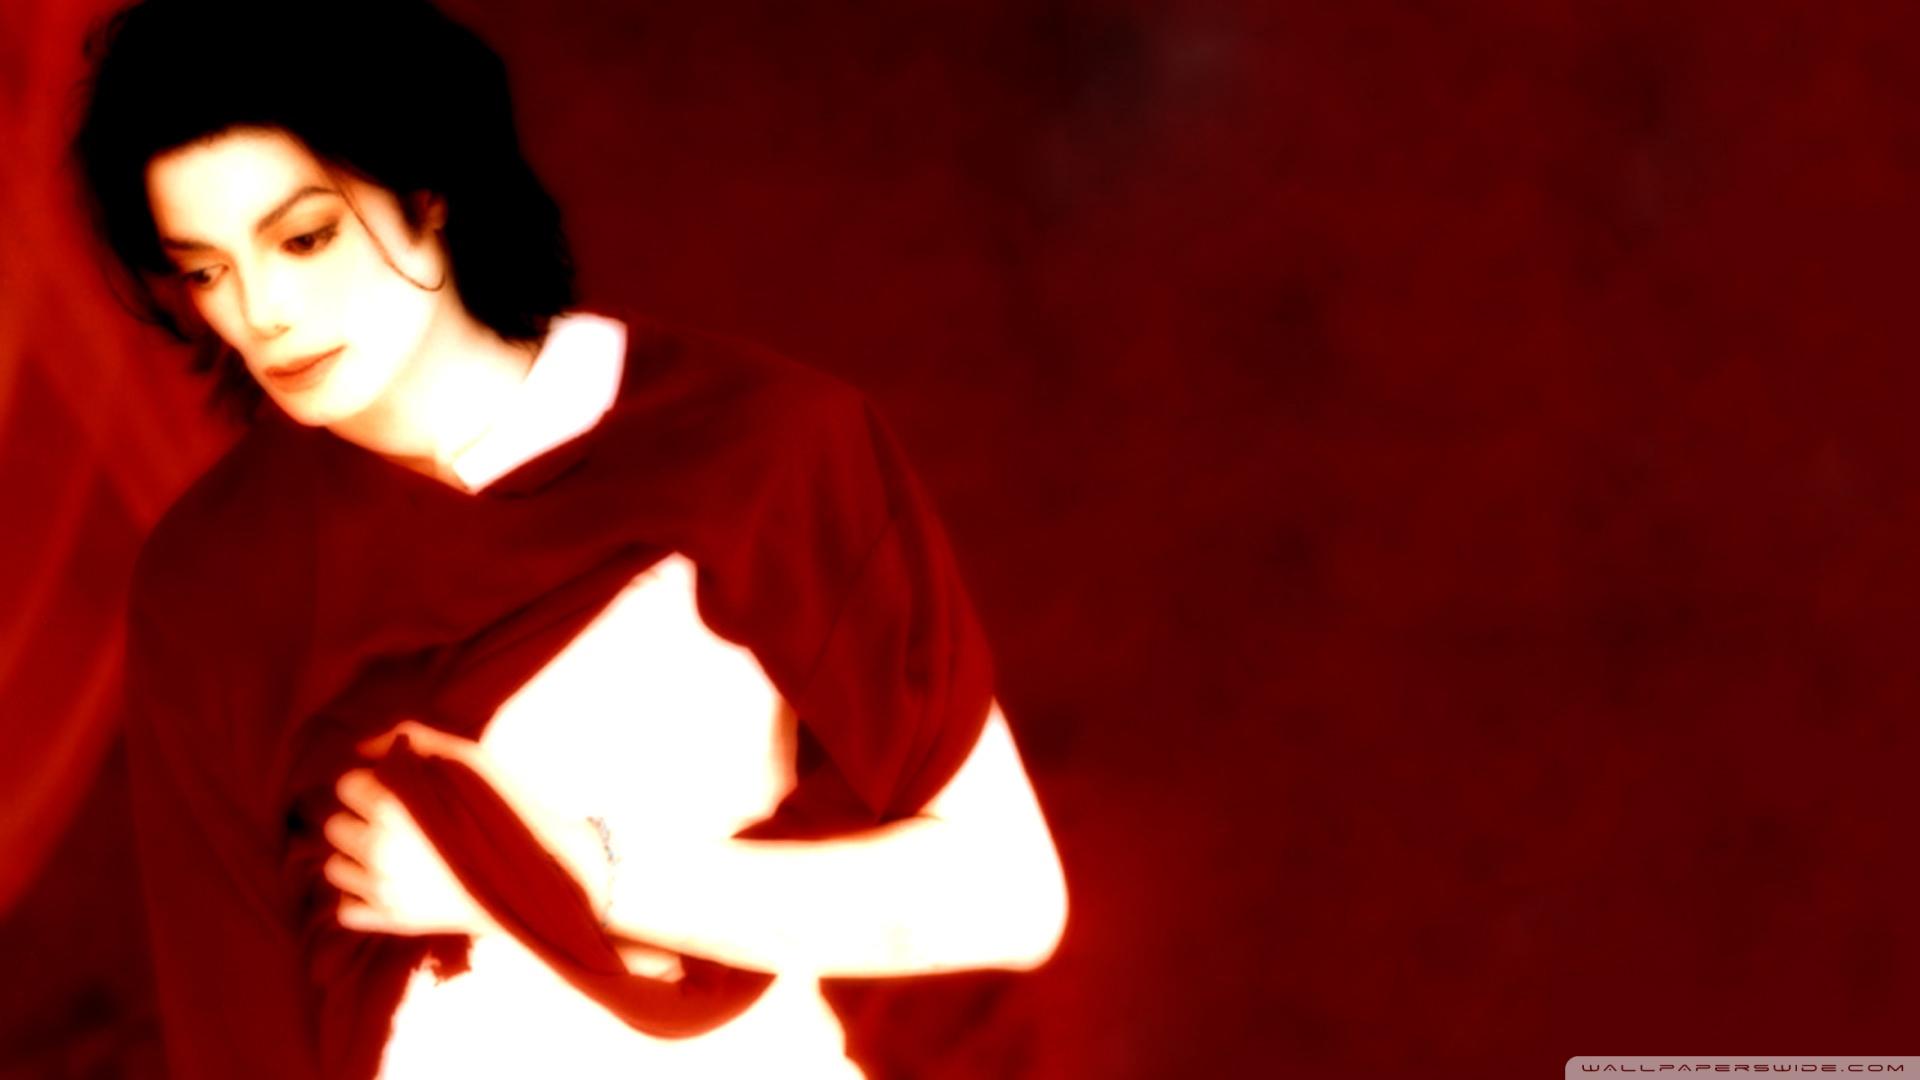 Standard - Hd Images Michael Jackson , HD Wallpaper & Backgrounds